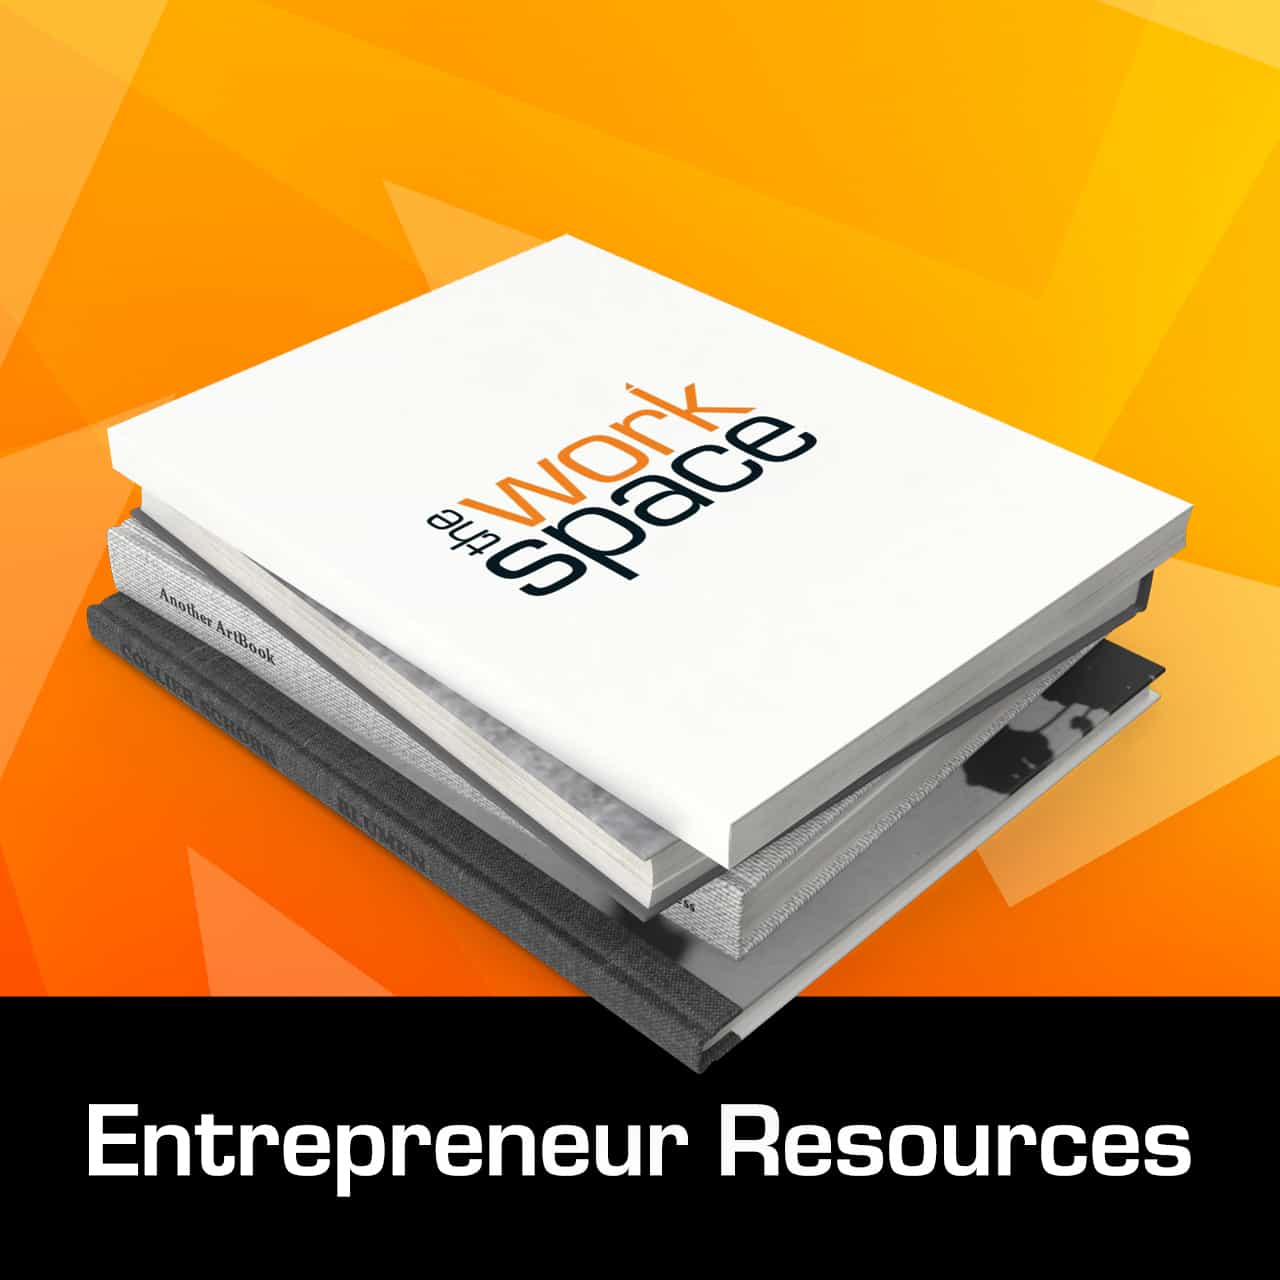 Entrepreneur resources